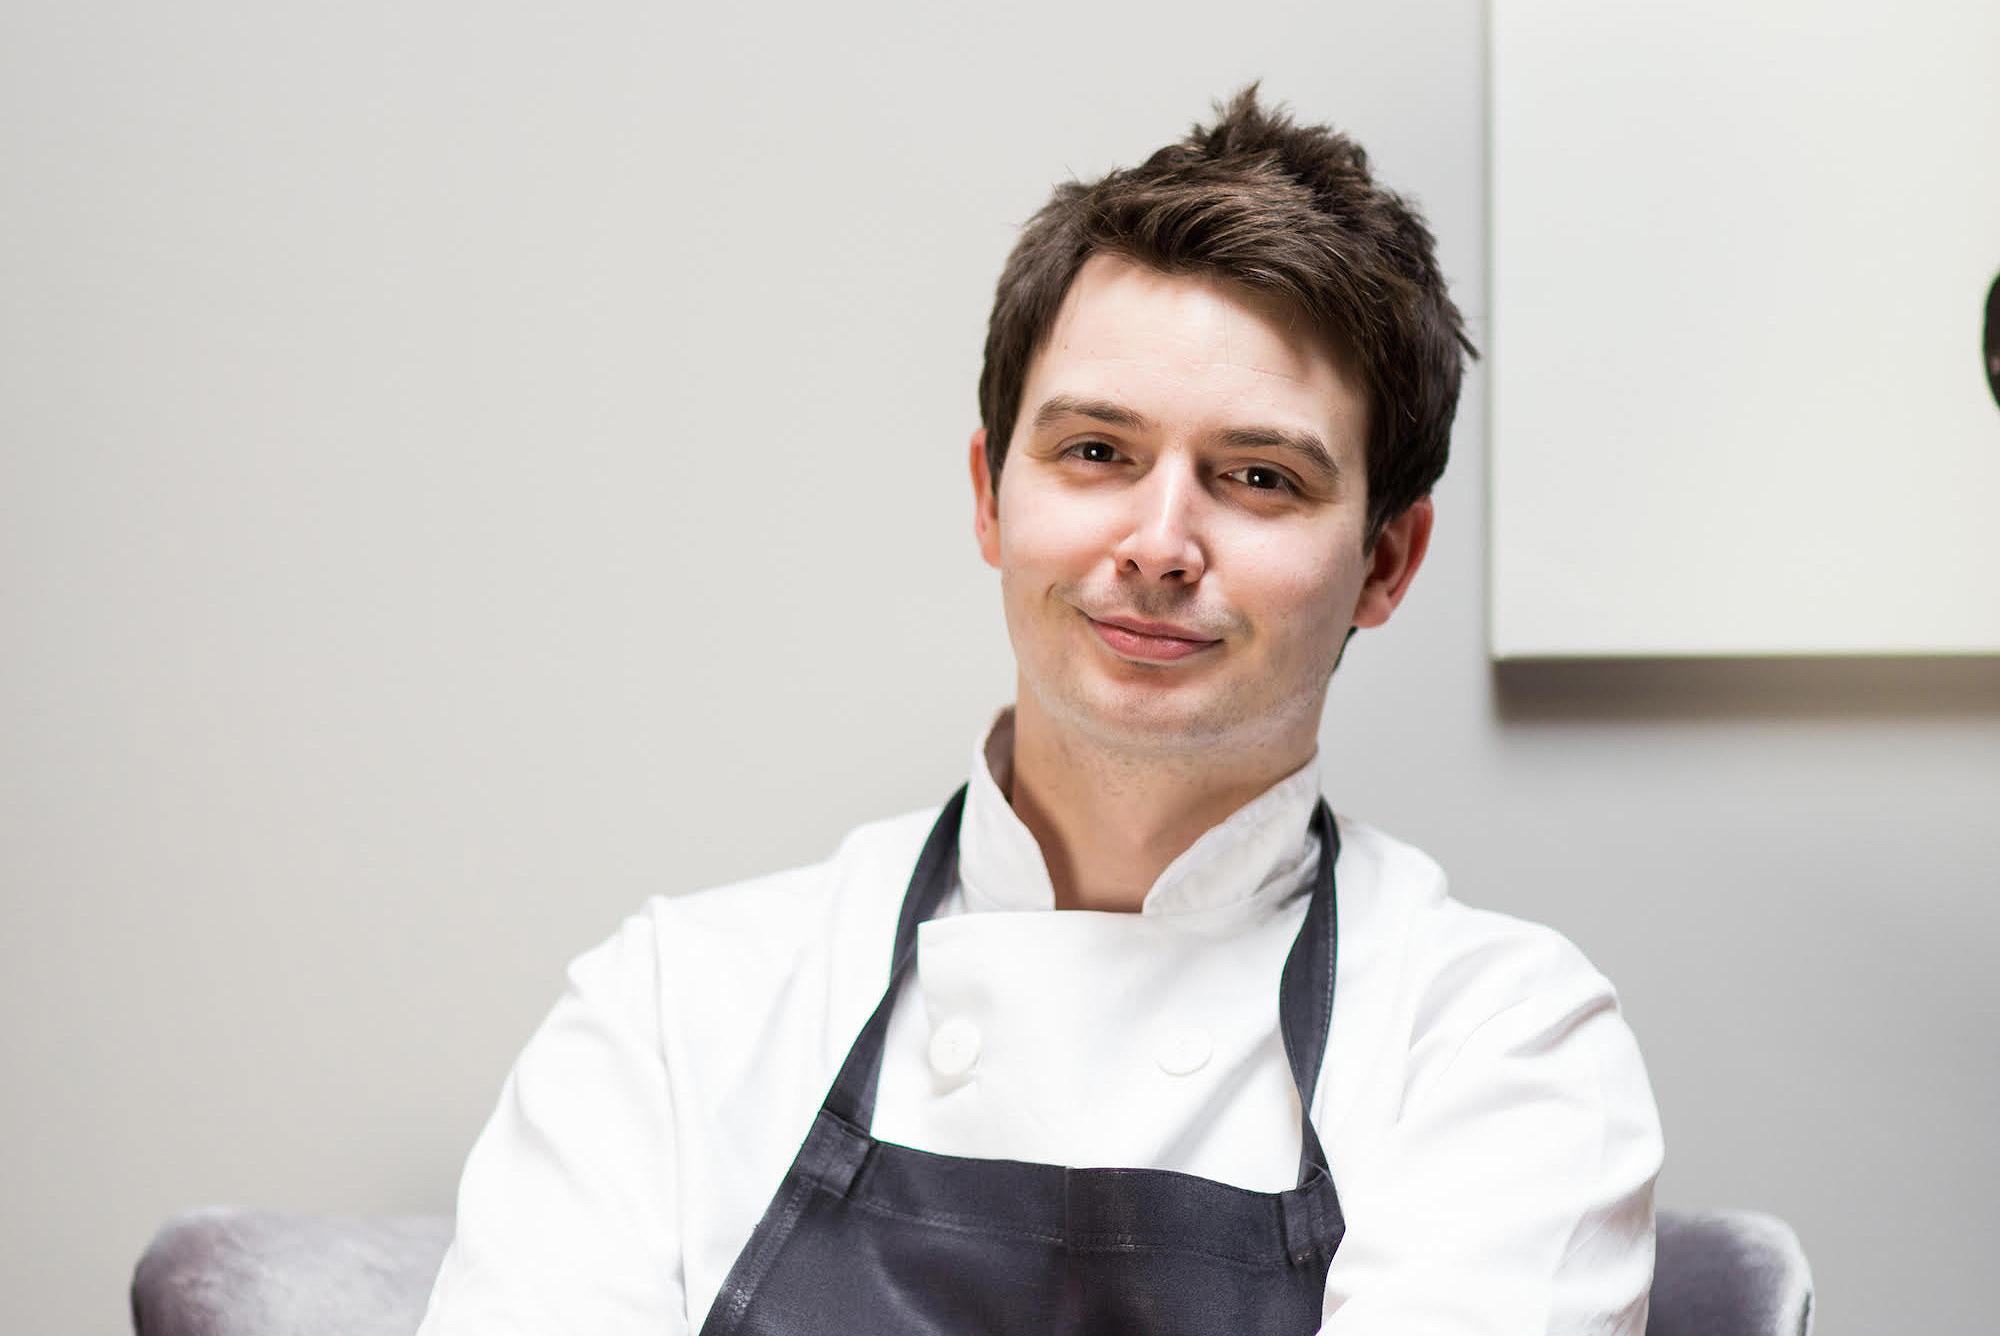 Derek Johnstone Becomes The New Chef At Scotland's Borthwick Castle